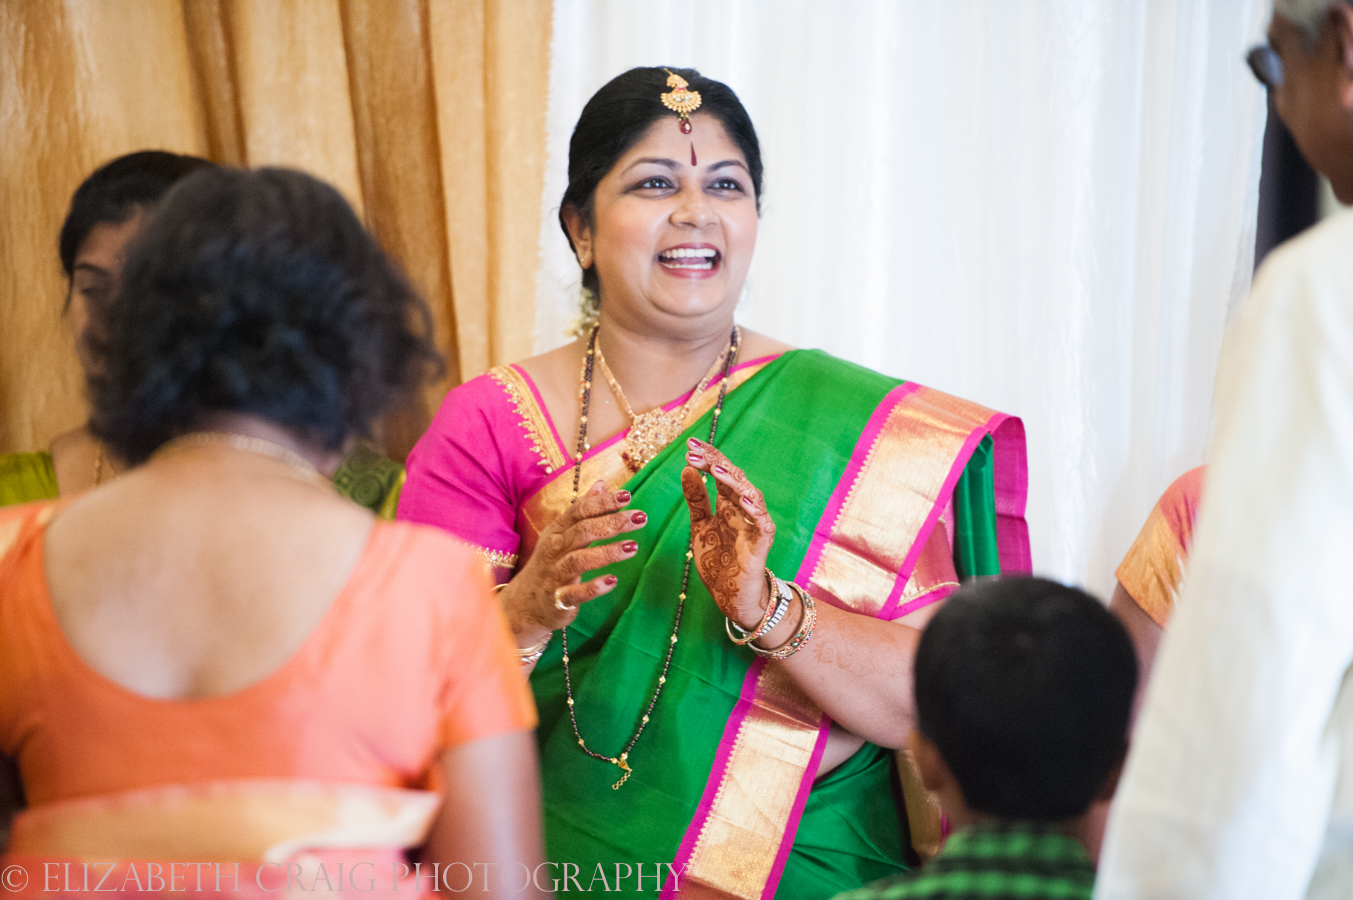 Monroeville Jain Temple Indian Weddings-6